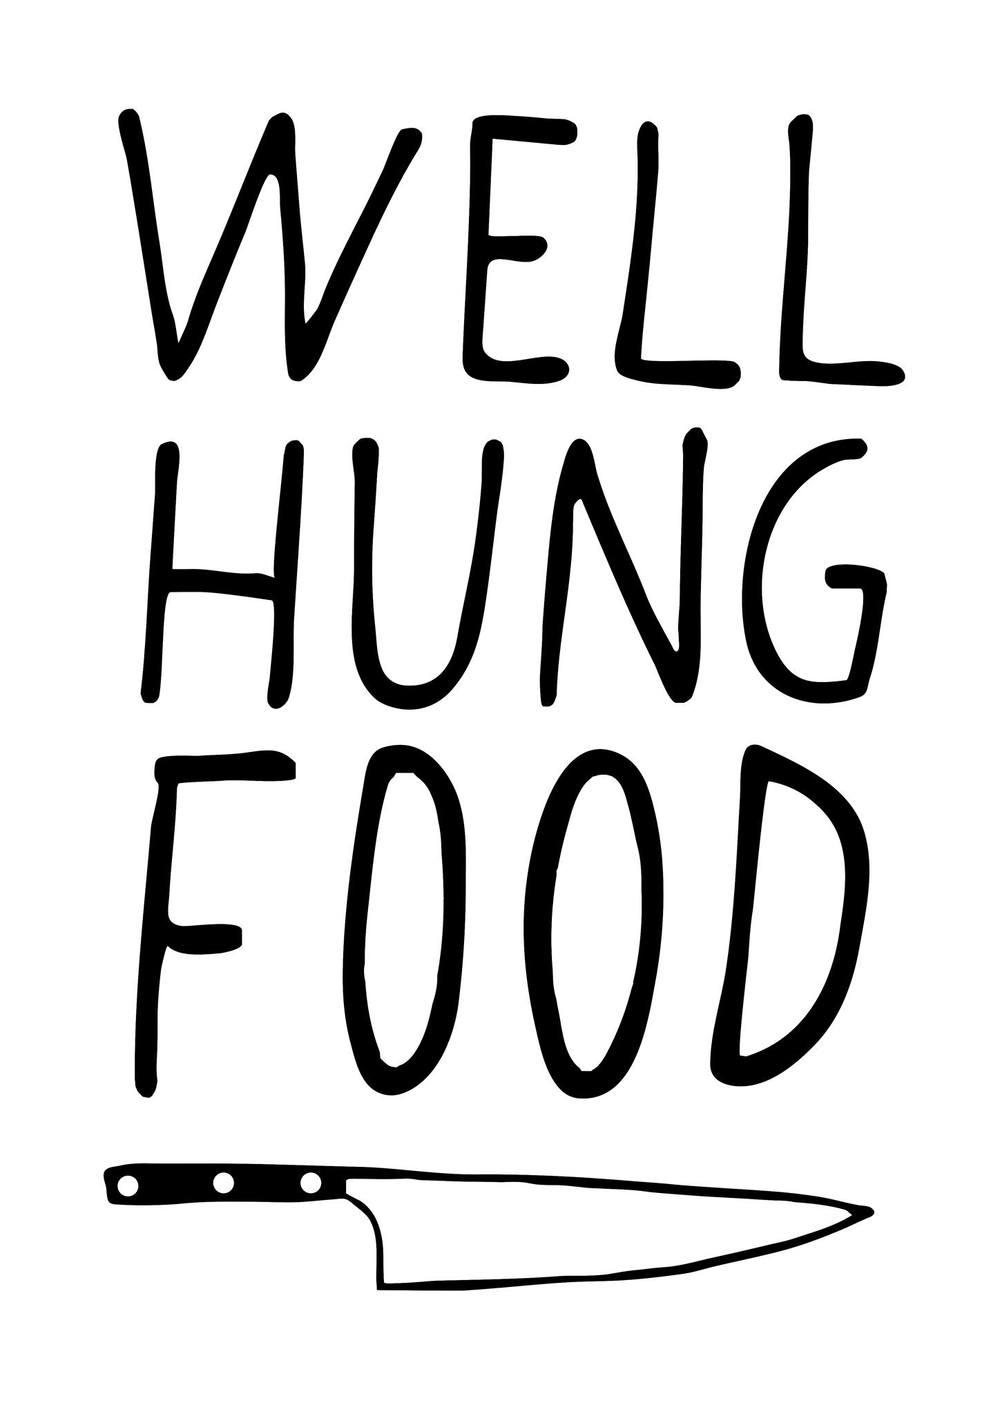 wellhungfood